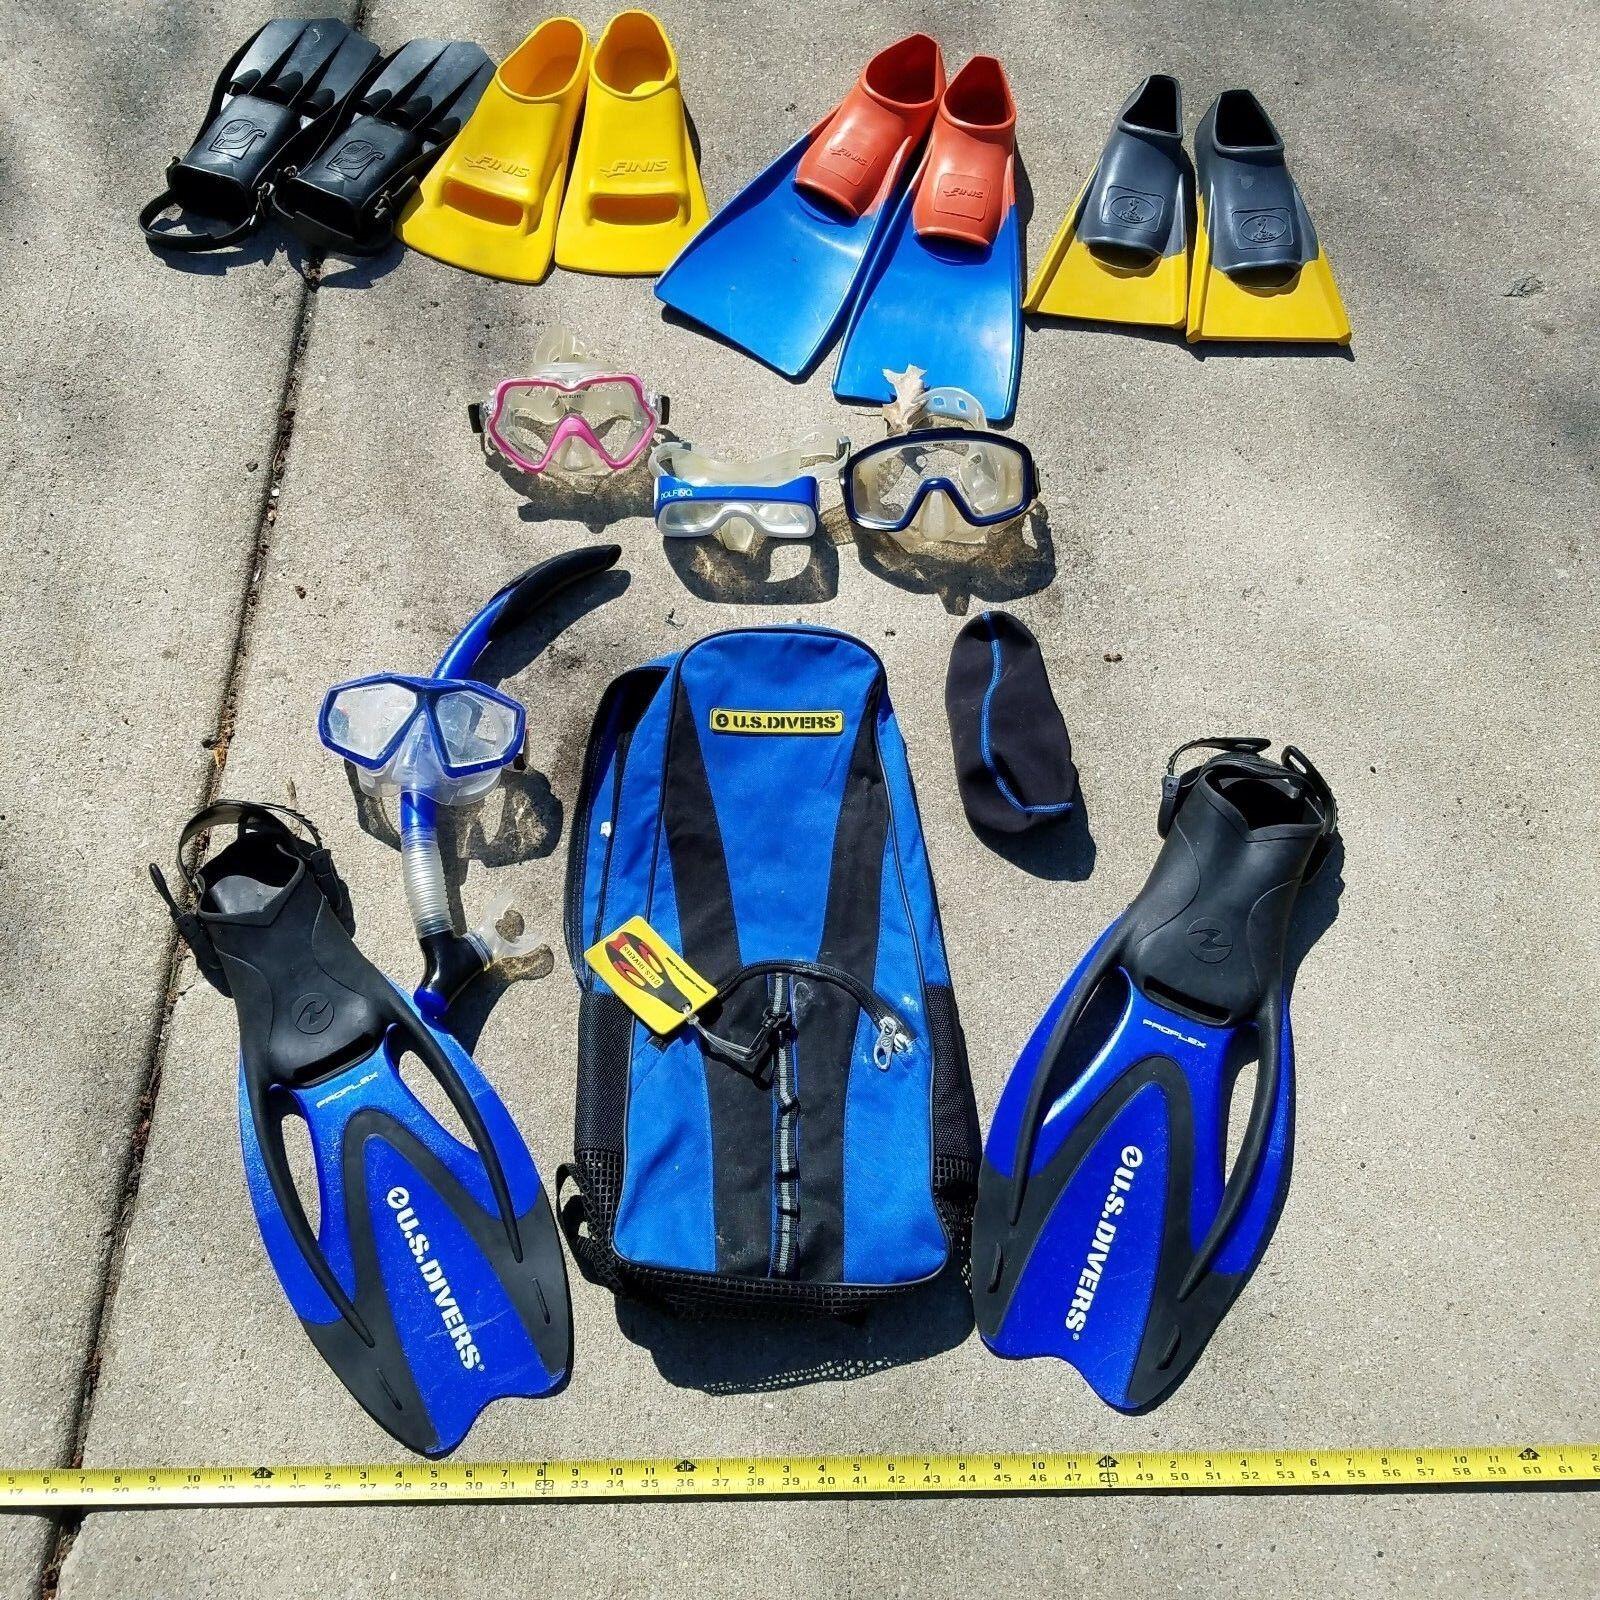 Lot Flippers Snorkel paddles Mask Goggles FINIS TYR KIEFER DOLFINO U.S Divers